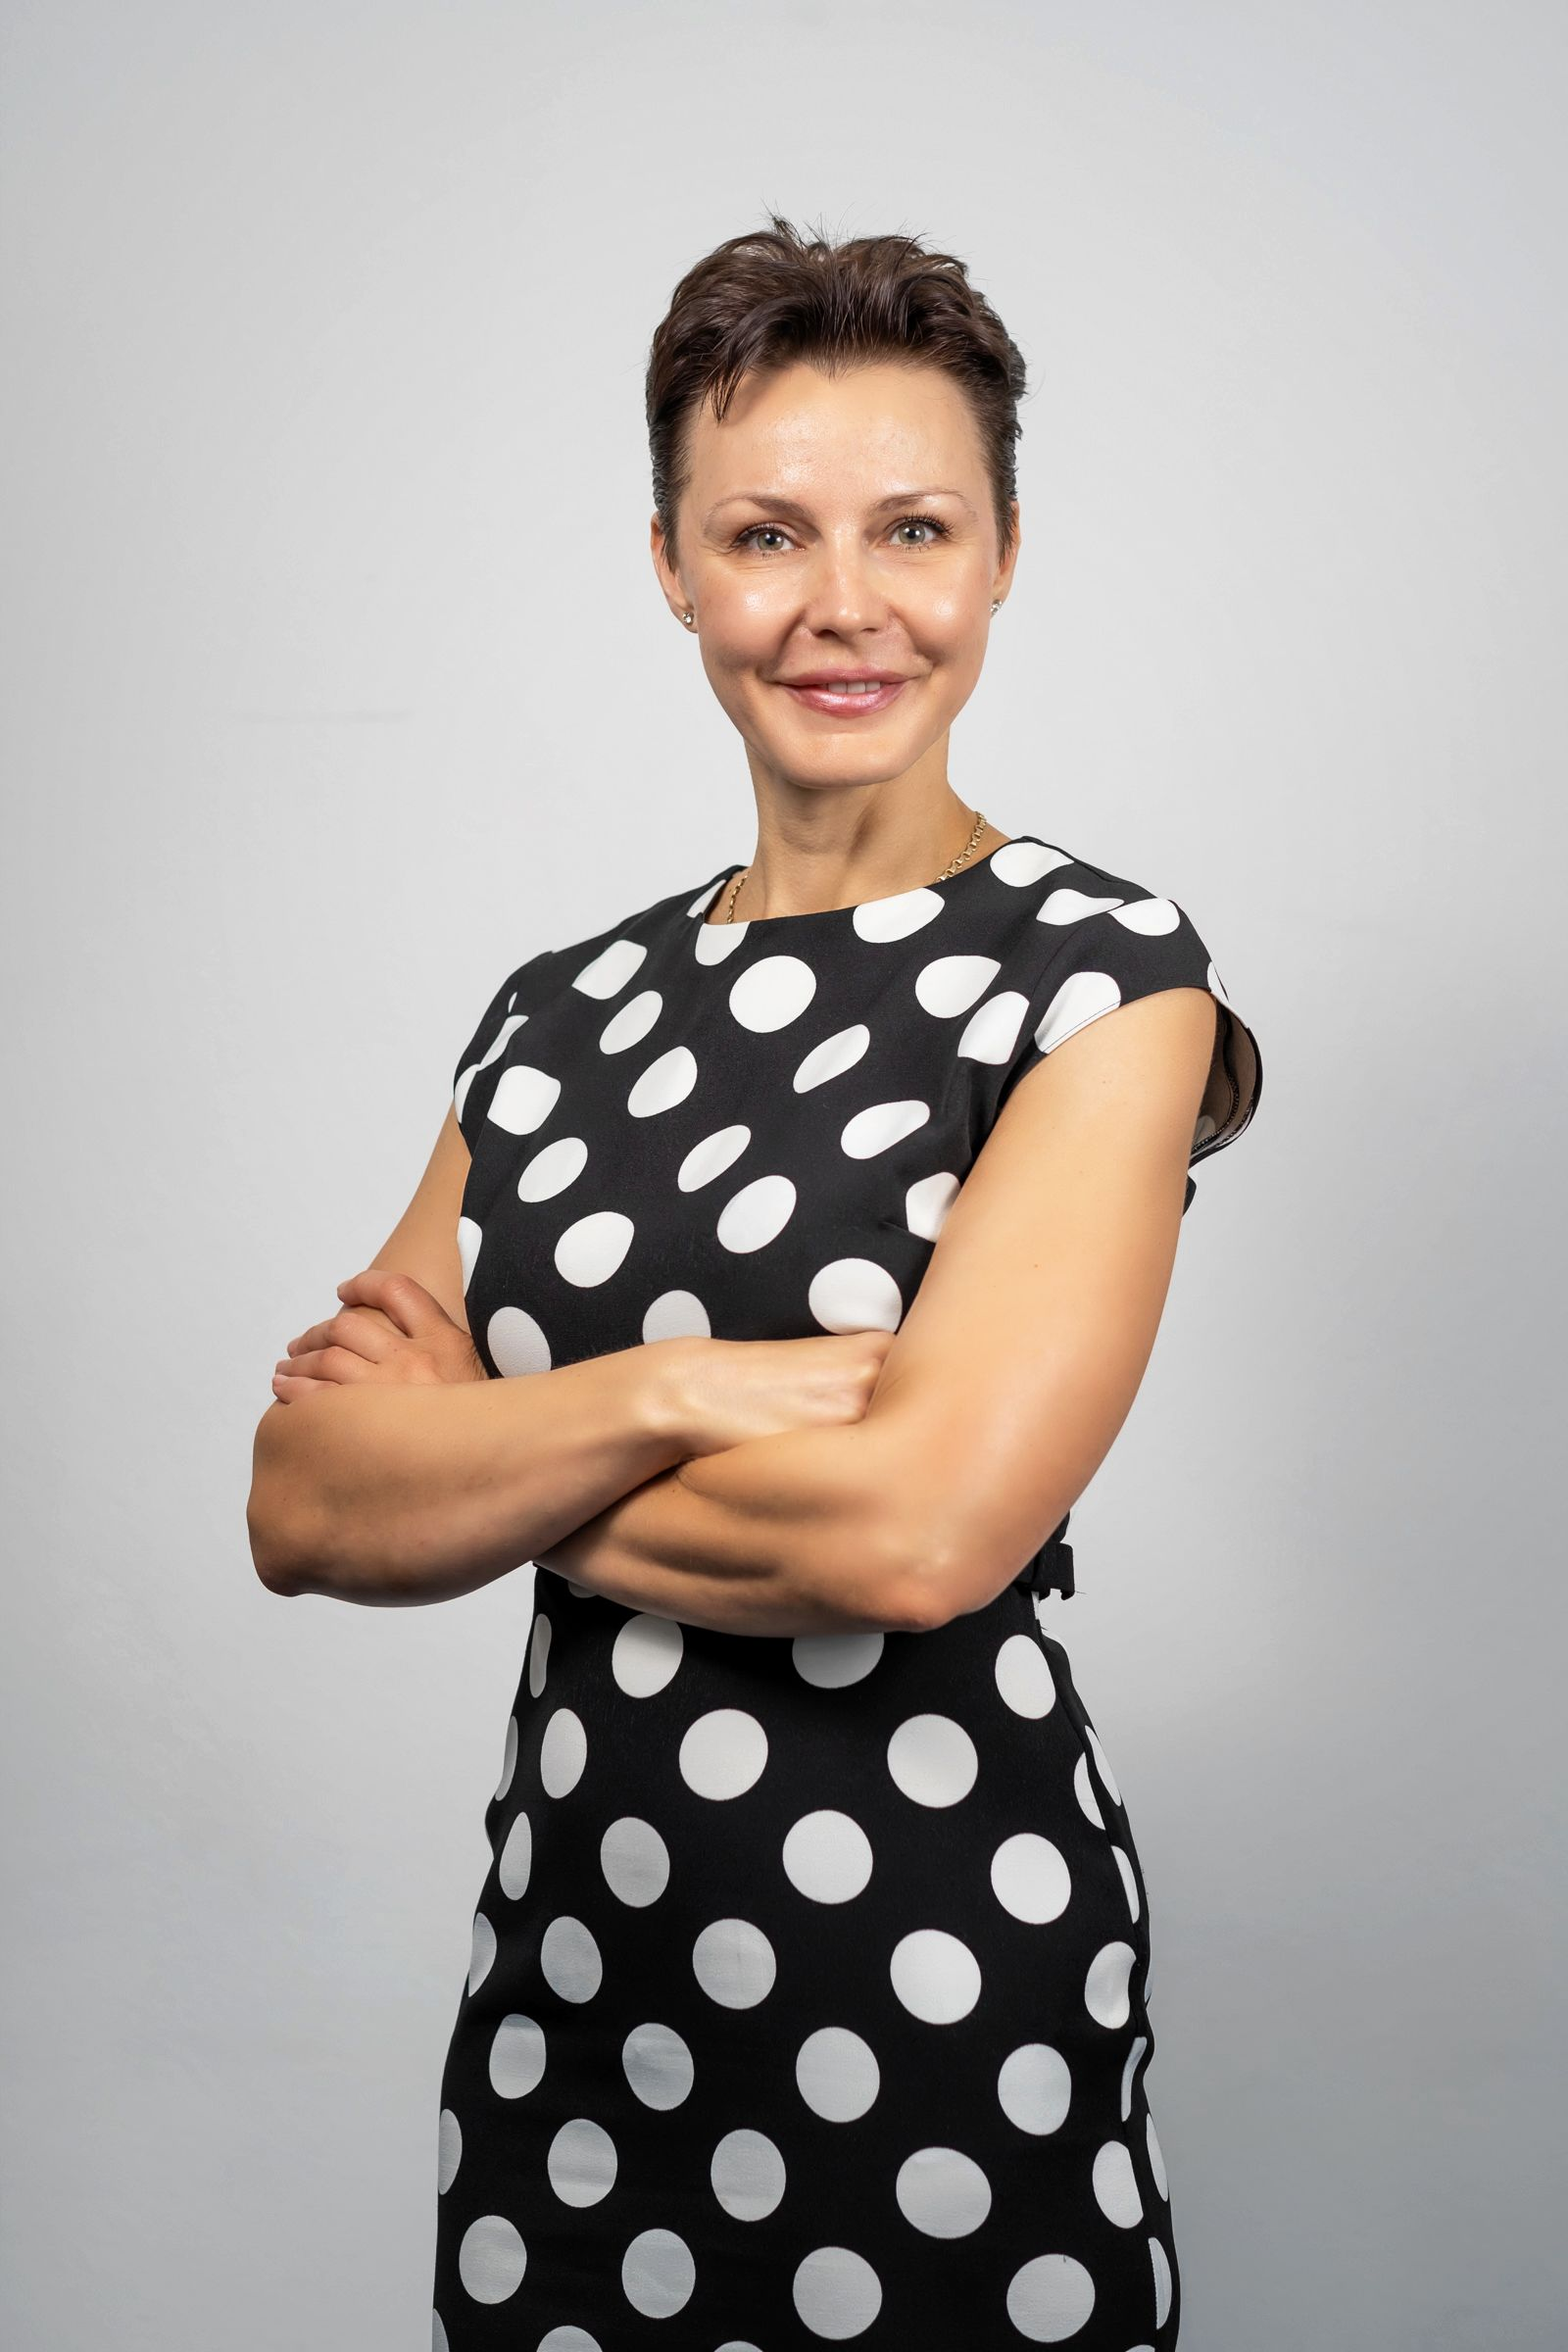 MUDr. Natalia Markova